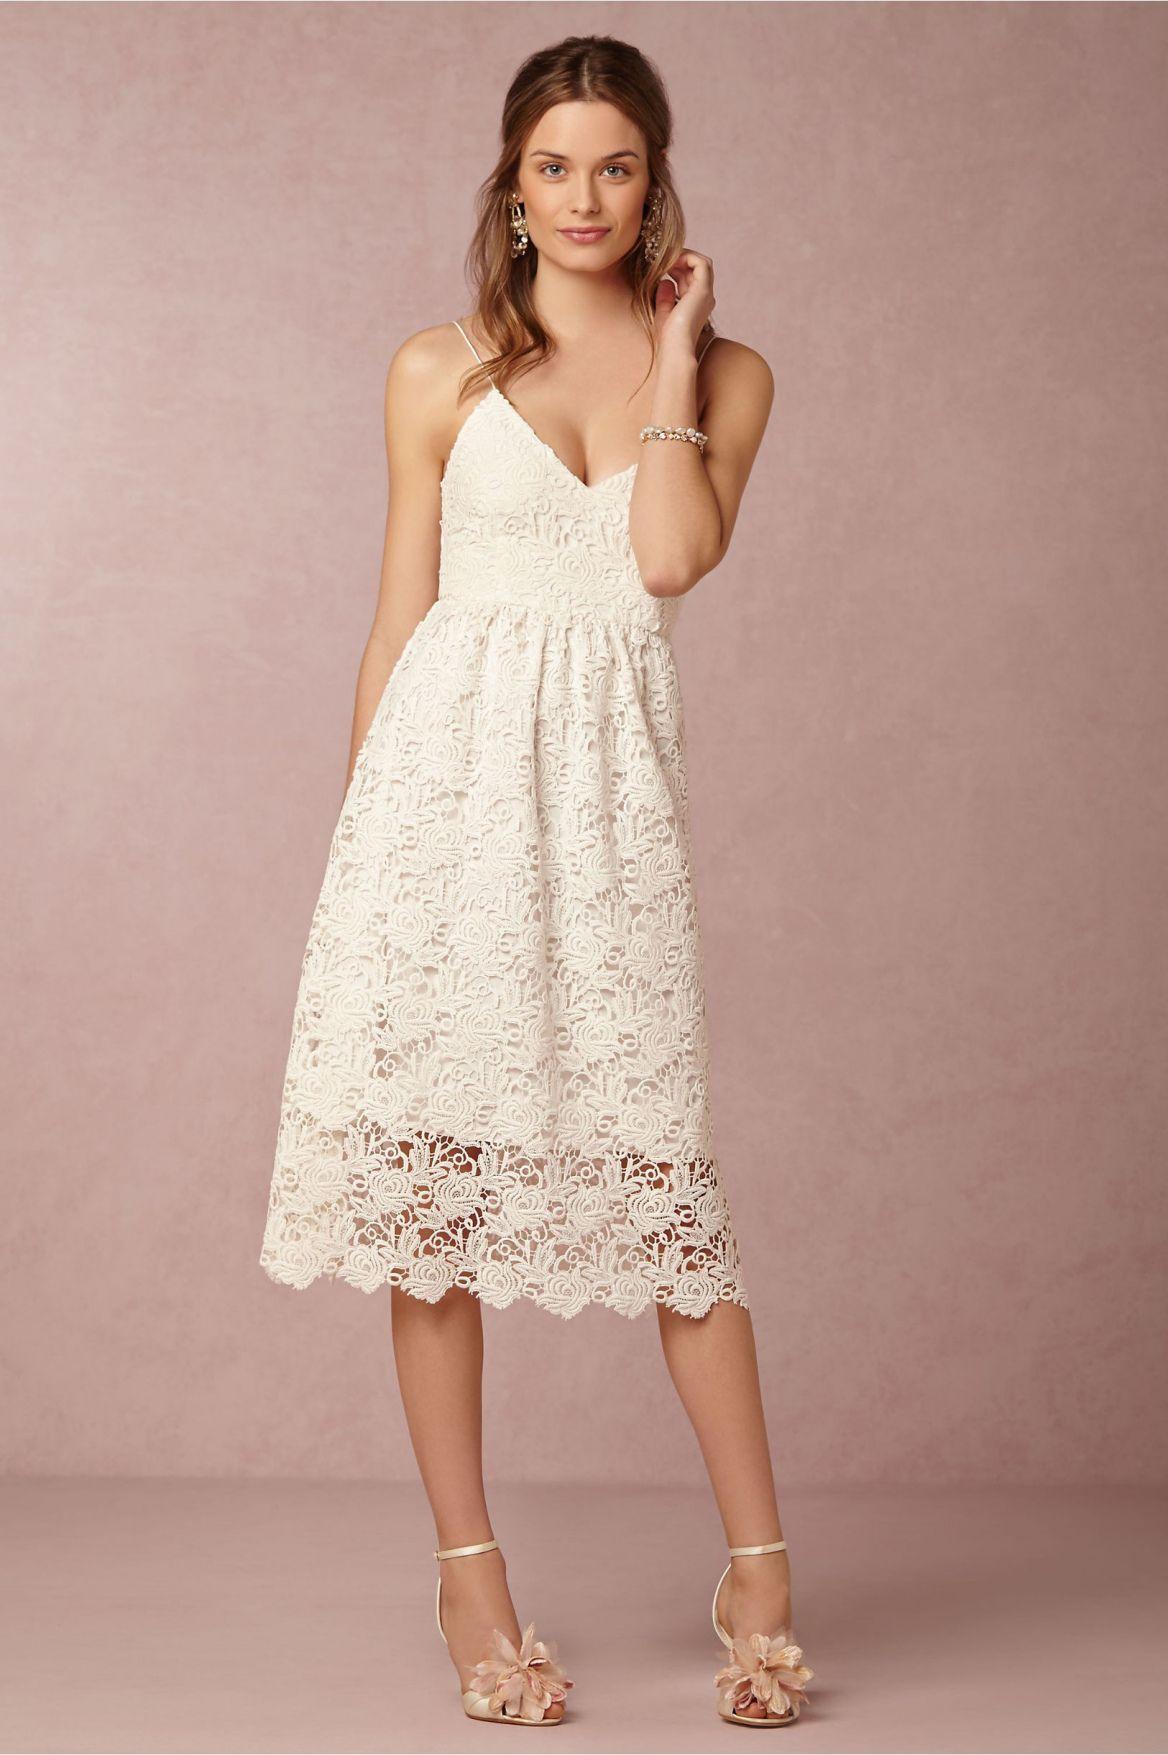 2019 Wedding Shower Dresses - Wedding Dresses for the Mature Bride ...